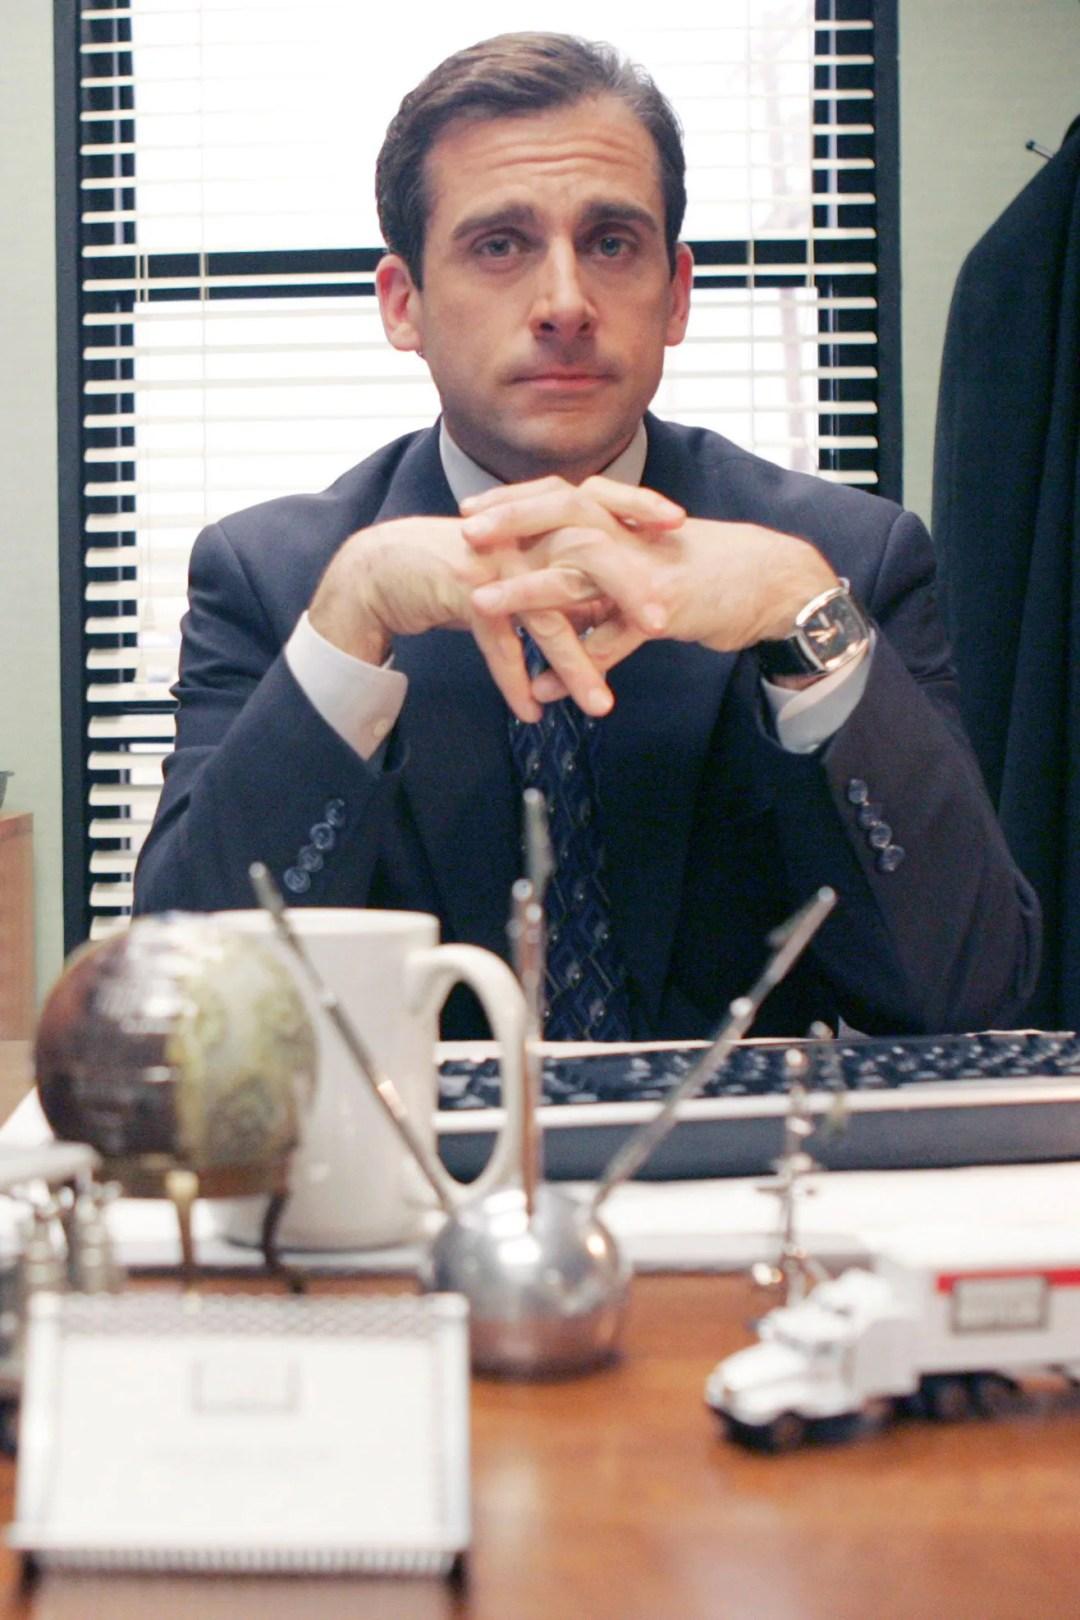 Steve Carell as Michael Scott